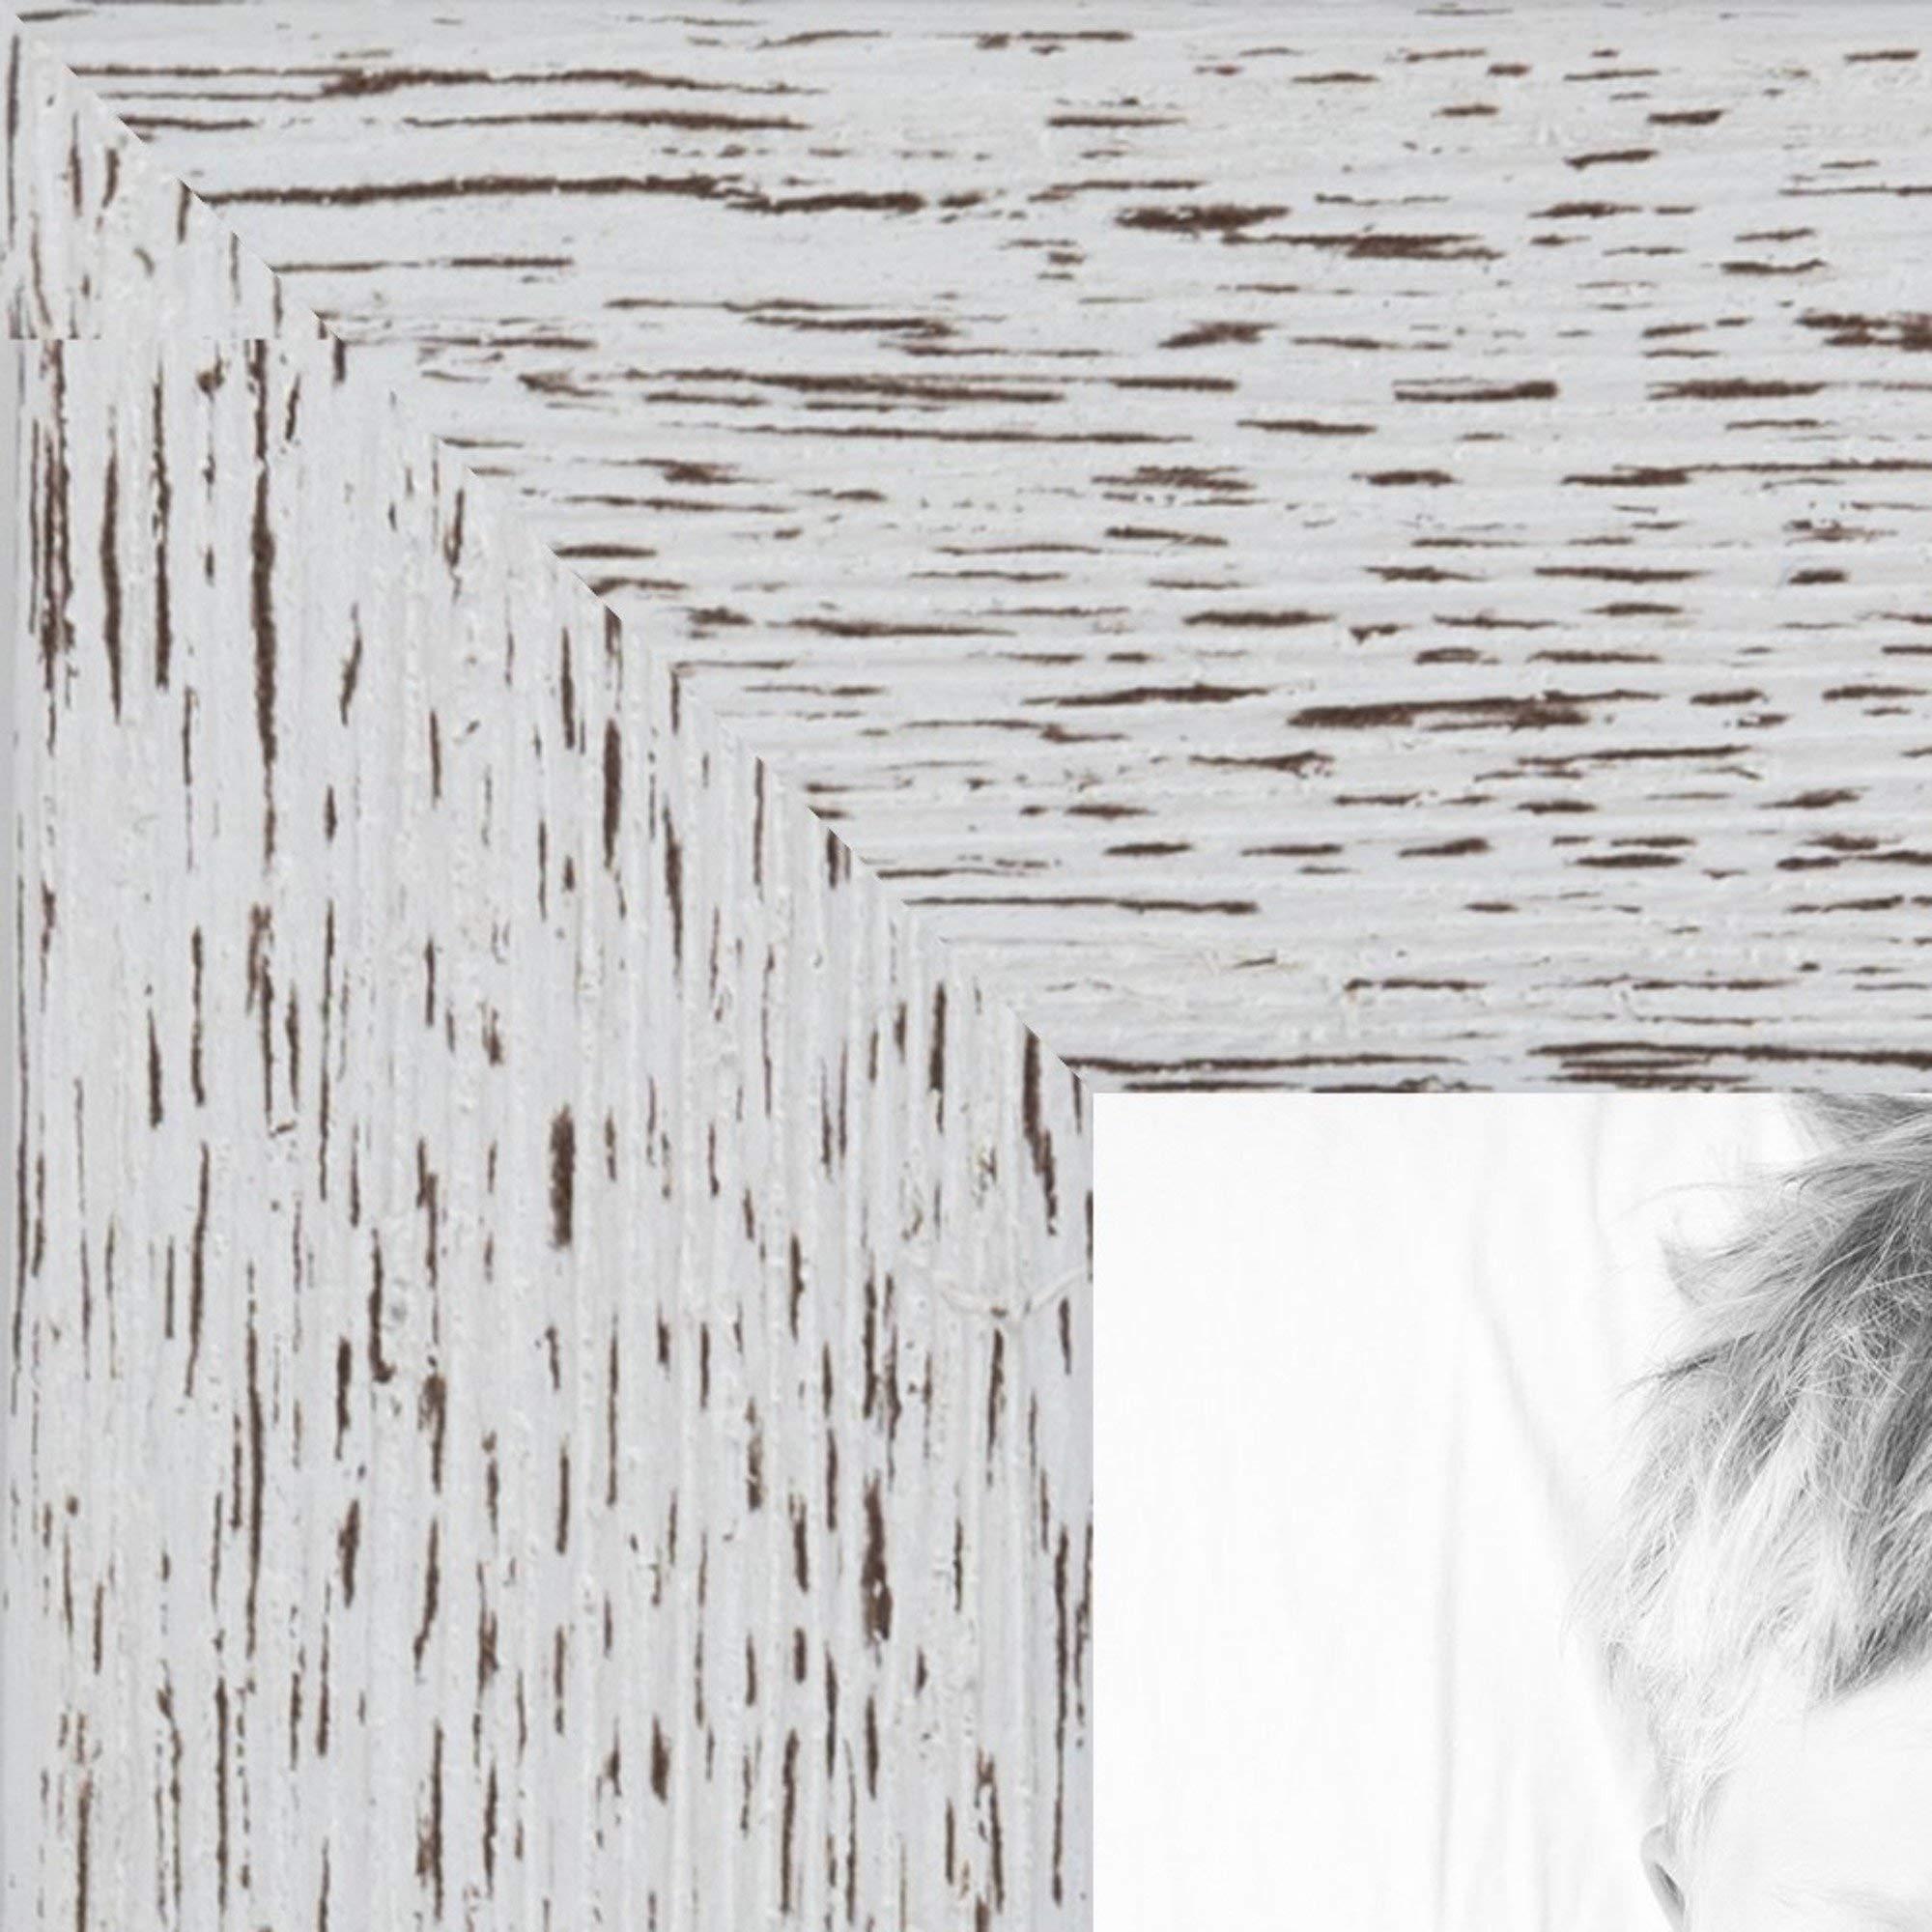 ArtToFrames 8x24 inch Eggshell Rustic Barnwood Wood Picture Frame, 2WOM0066-1343-YWHT-8x24